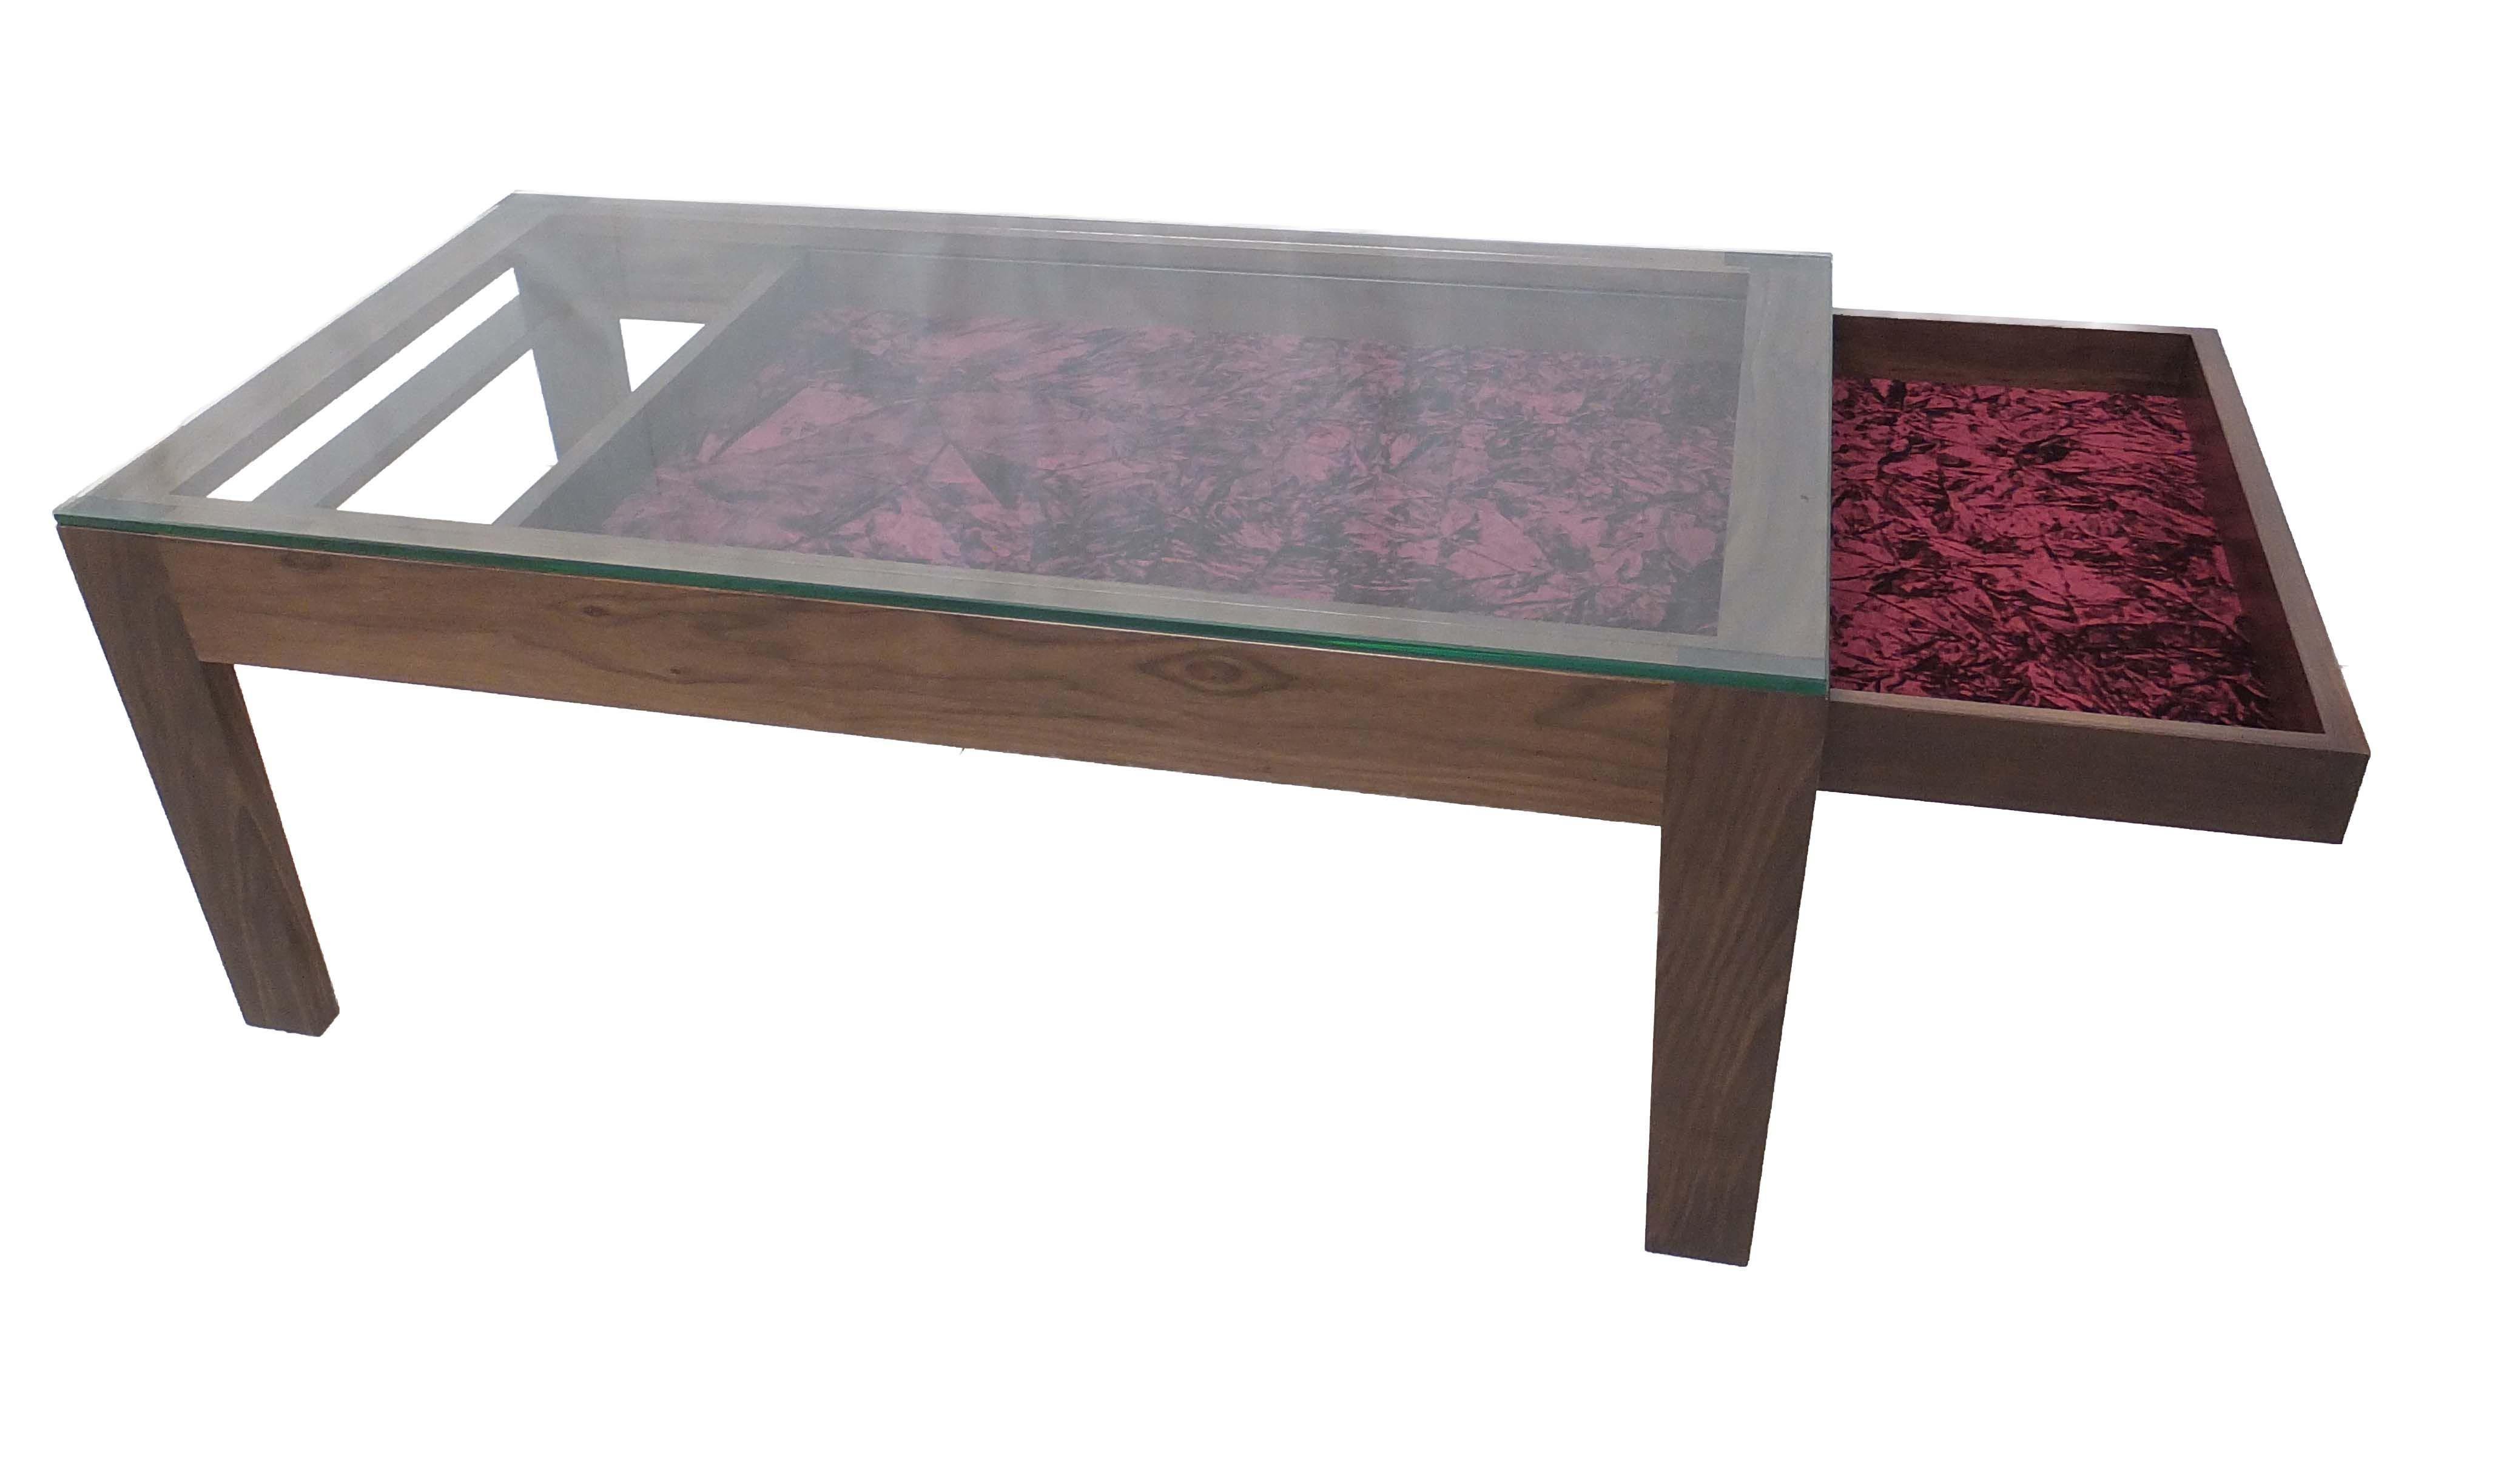 Glass Display Coffee Table Coffee Table Plans Coffee Table Wood Coffee Table